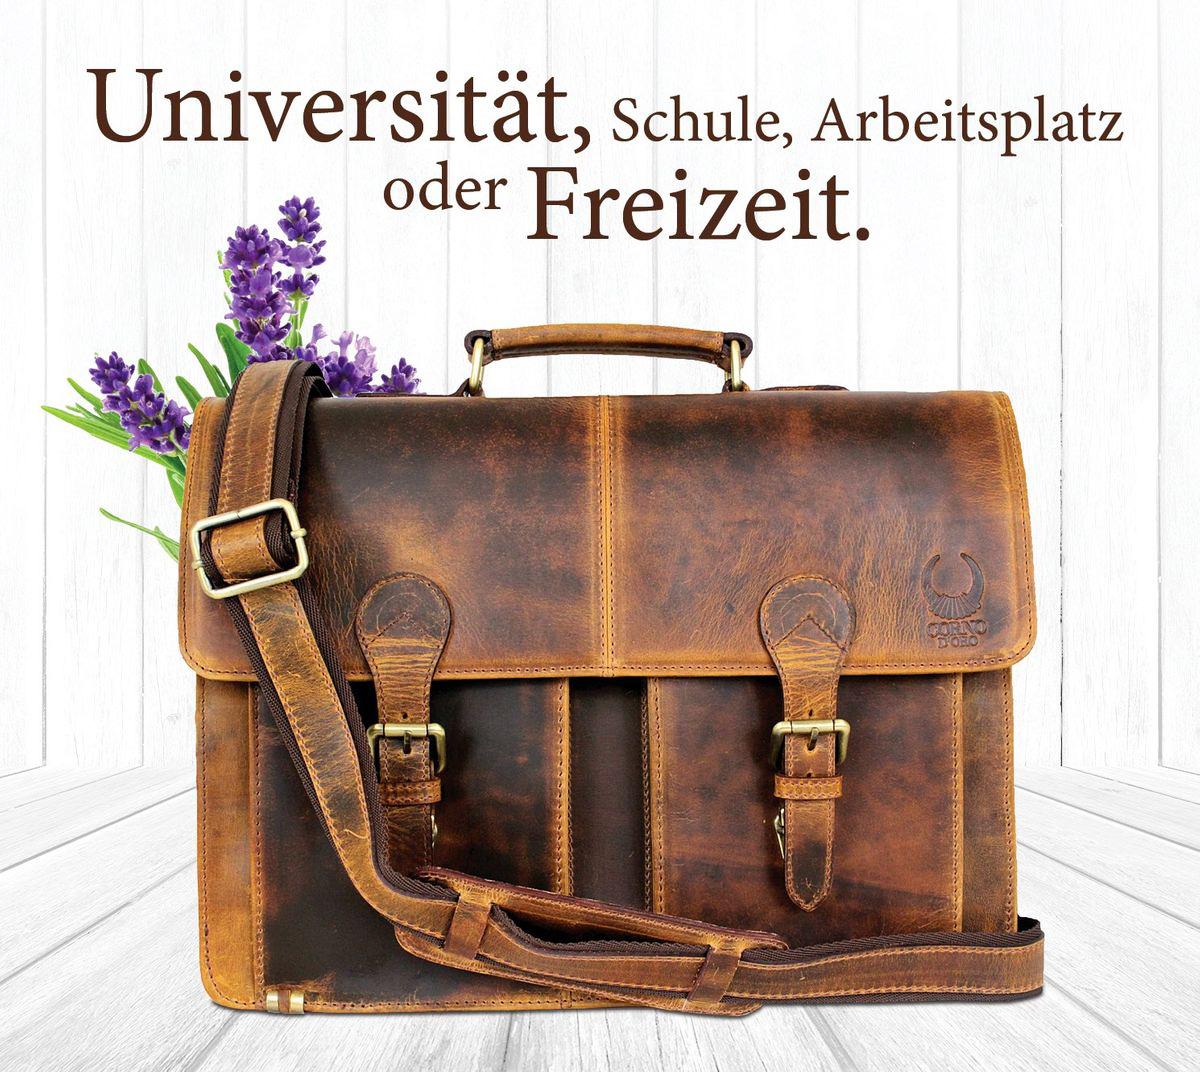 Leder Aktentasche Damen & Herren - Laptoptasche 15.6 Zoll Laptop